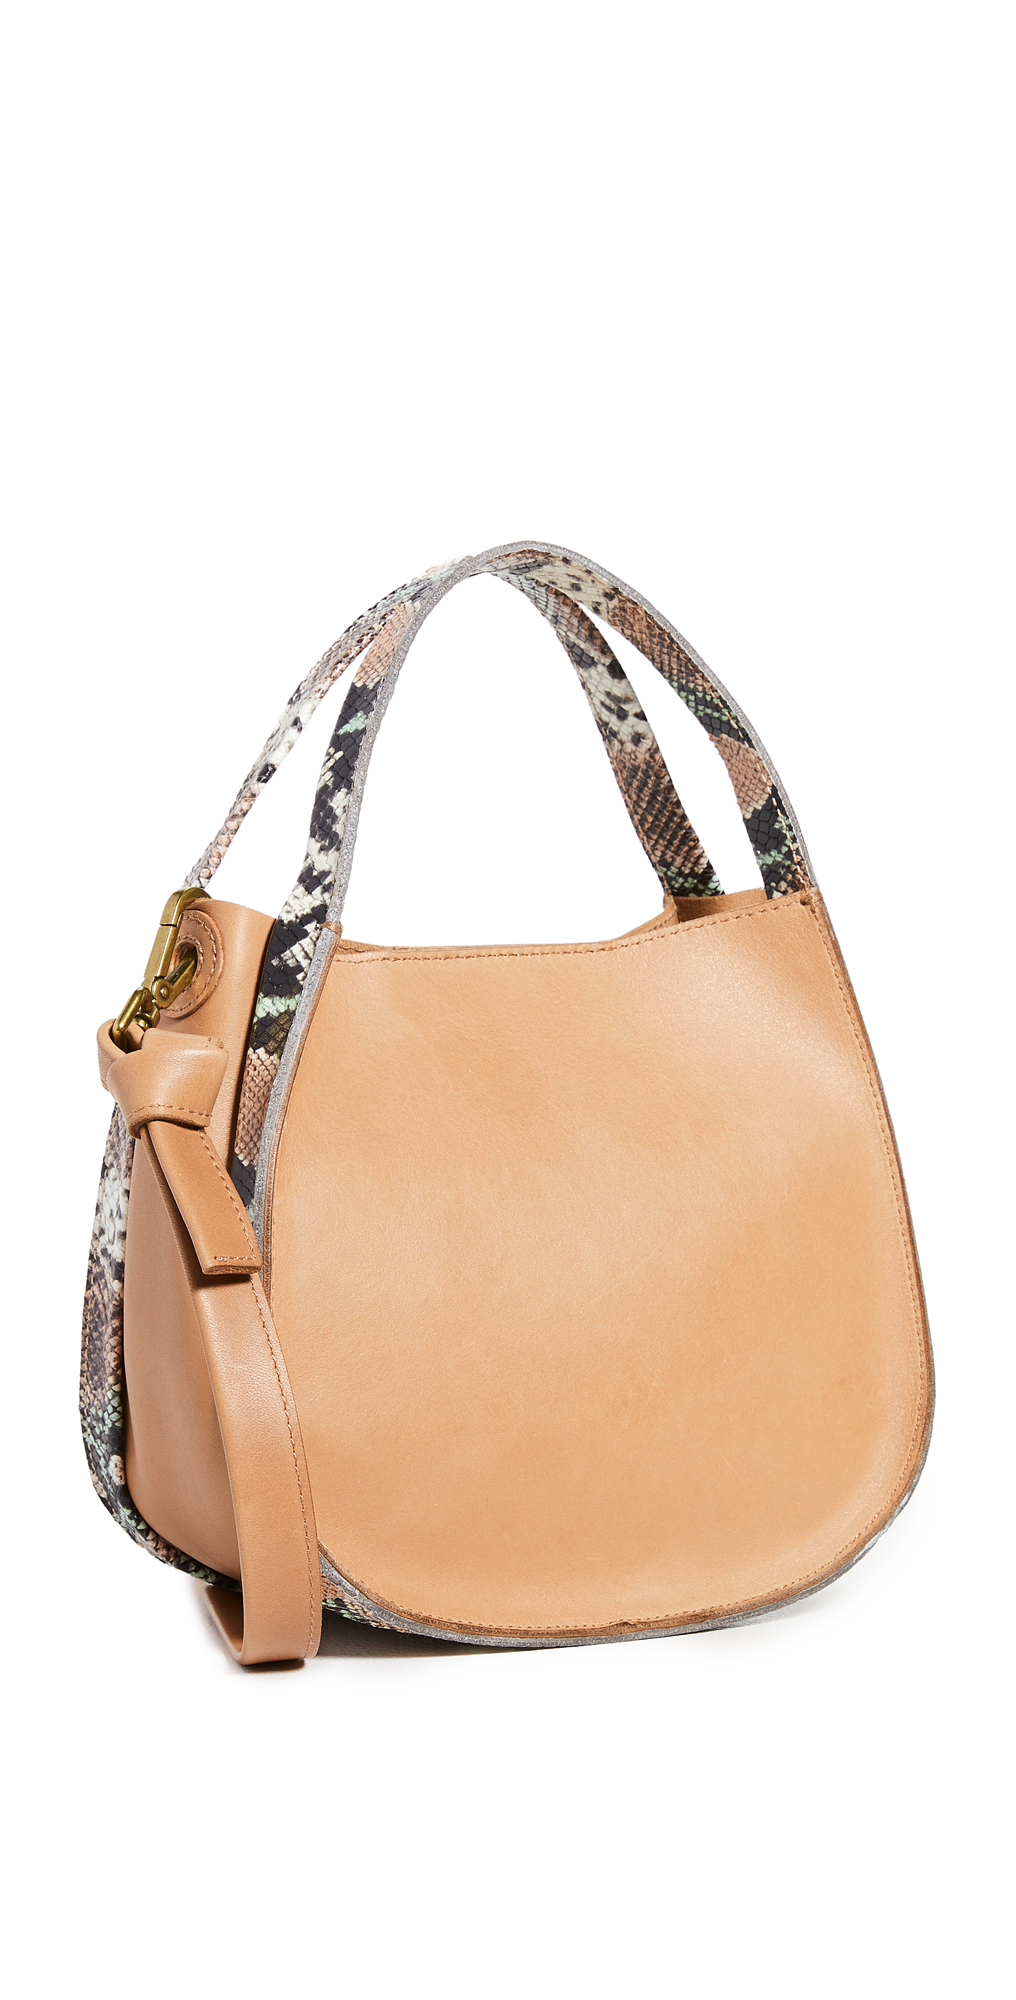 Madewell Sydney Crossbody Bag